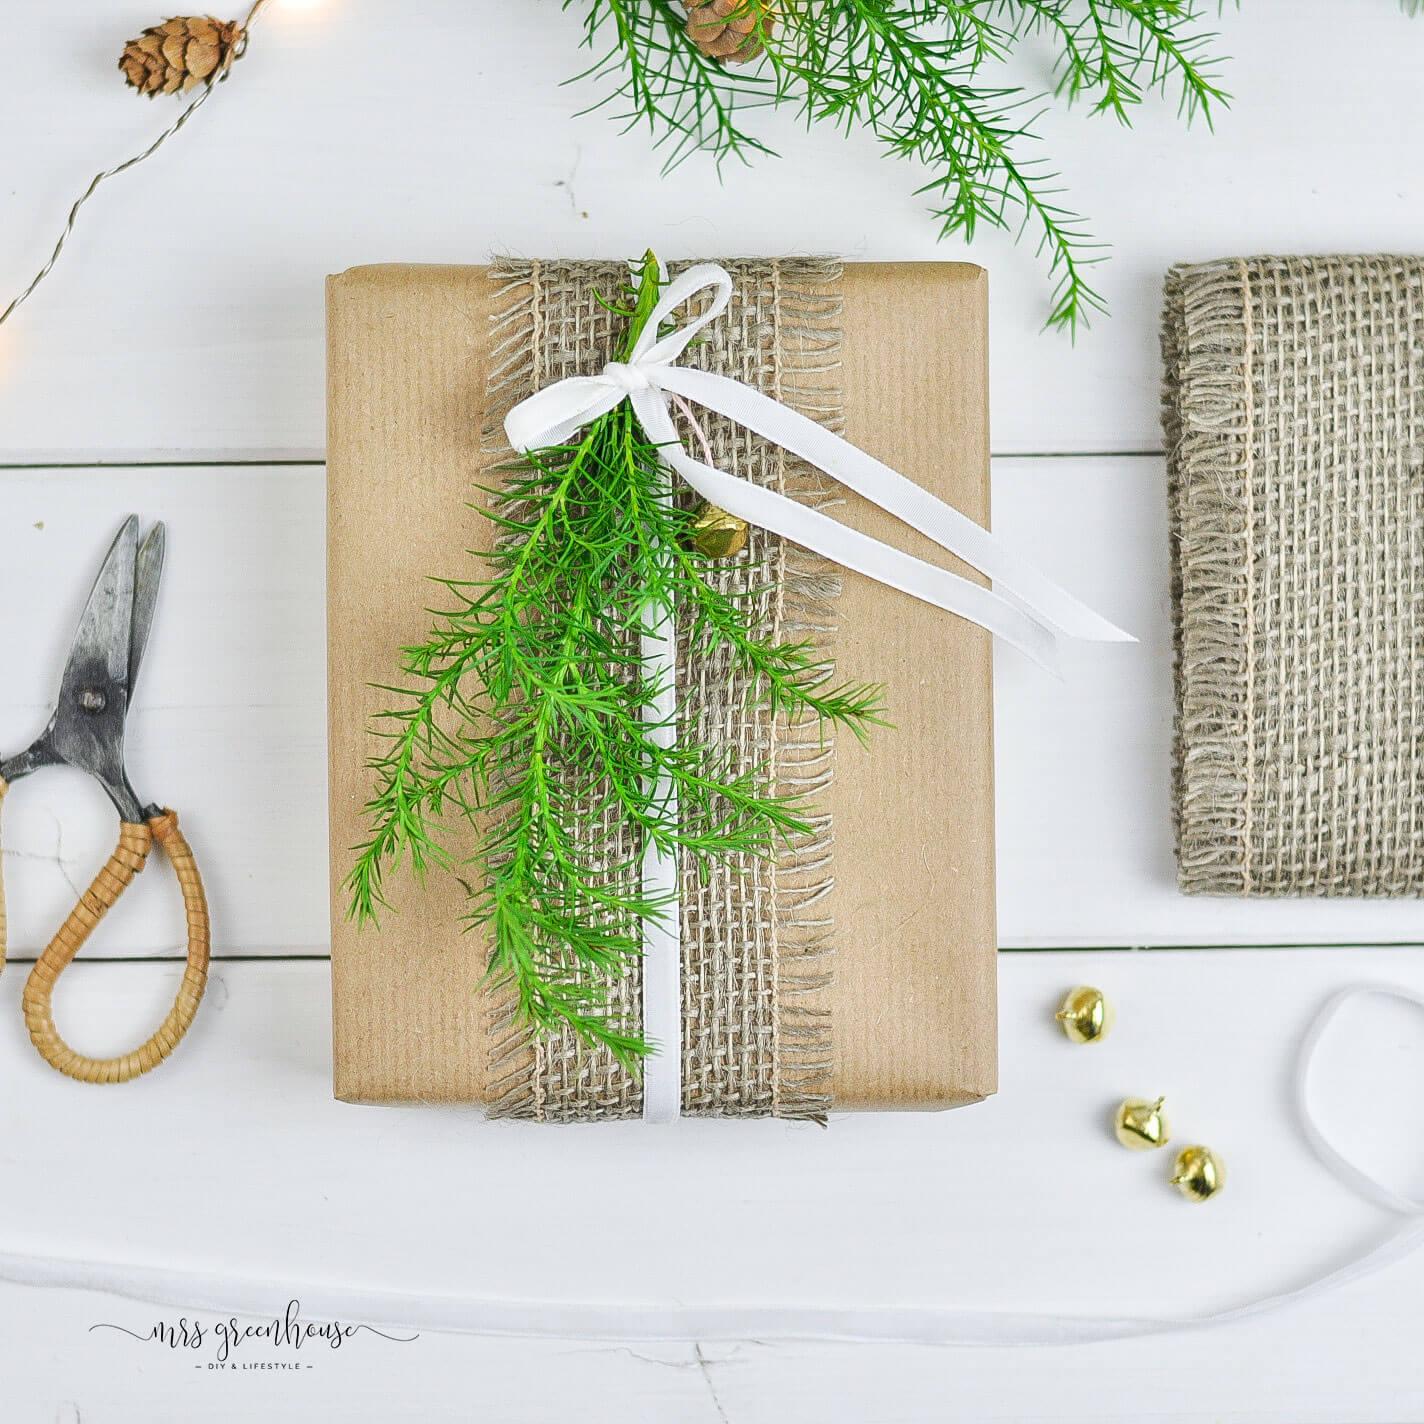 Geschenk mit Sisalband verpackt